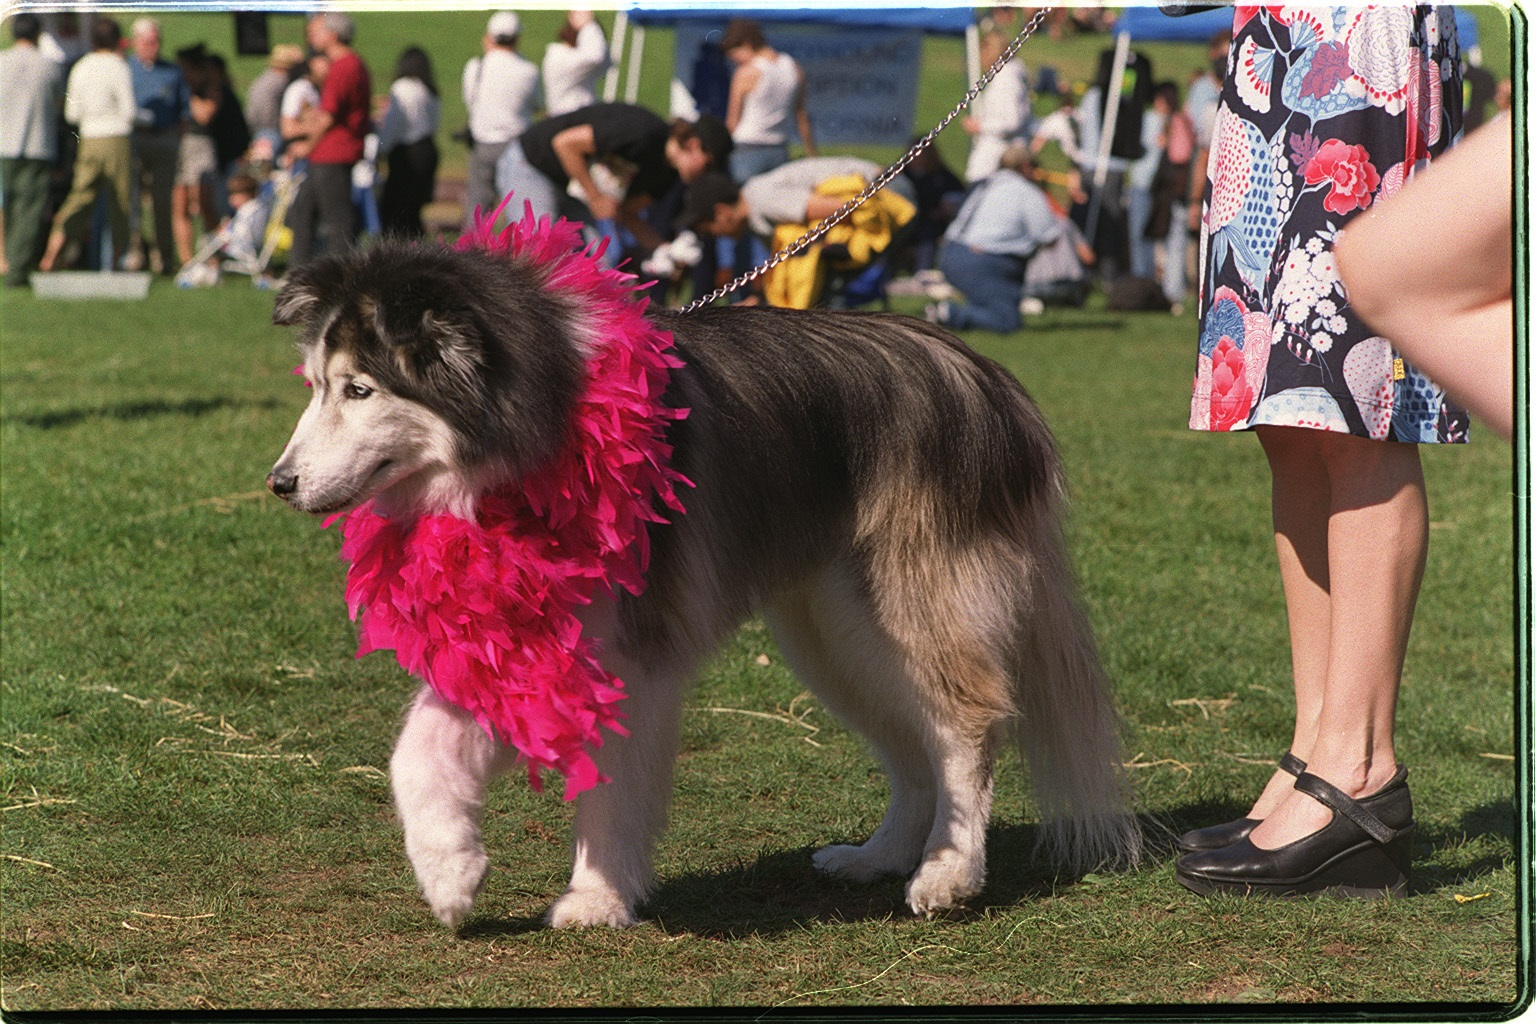 file:husky wearing halloween costume, 2002 - wikimedia commons